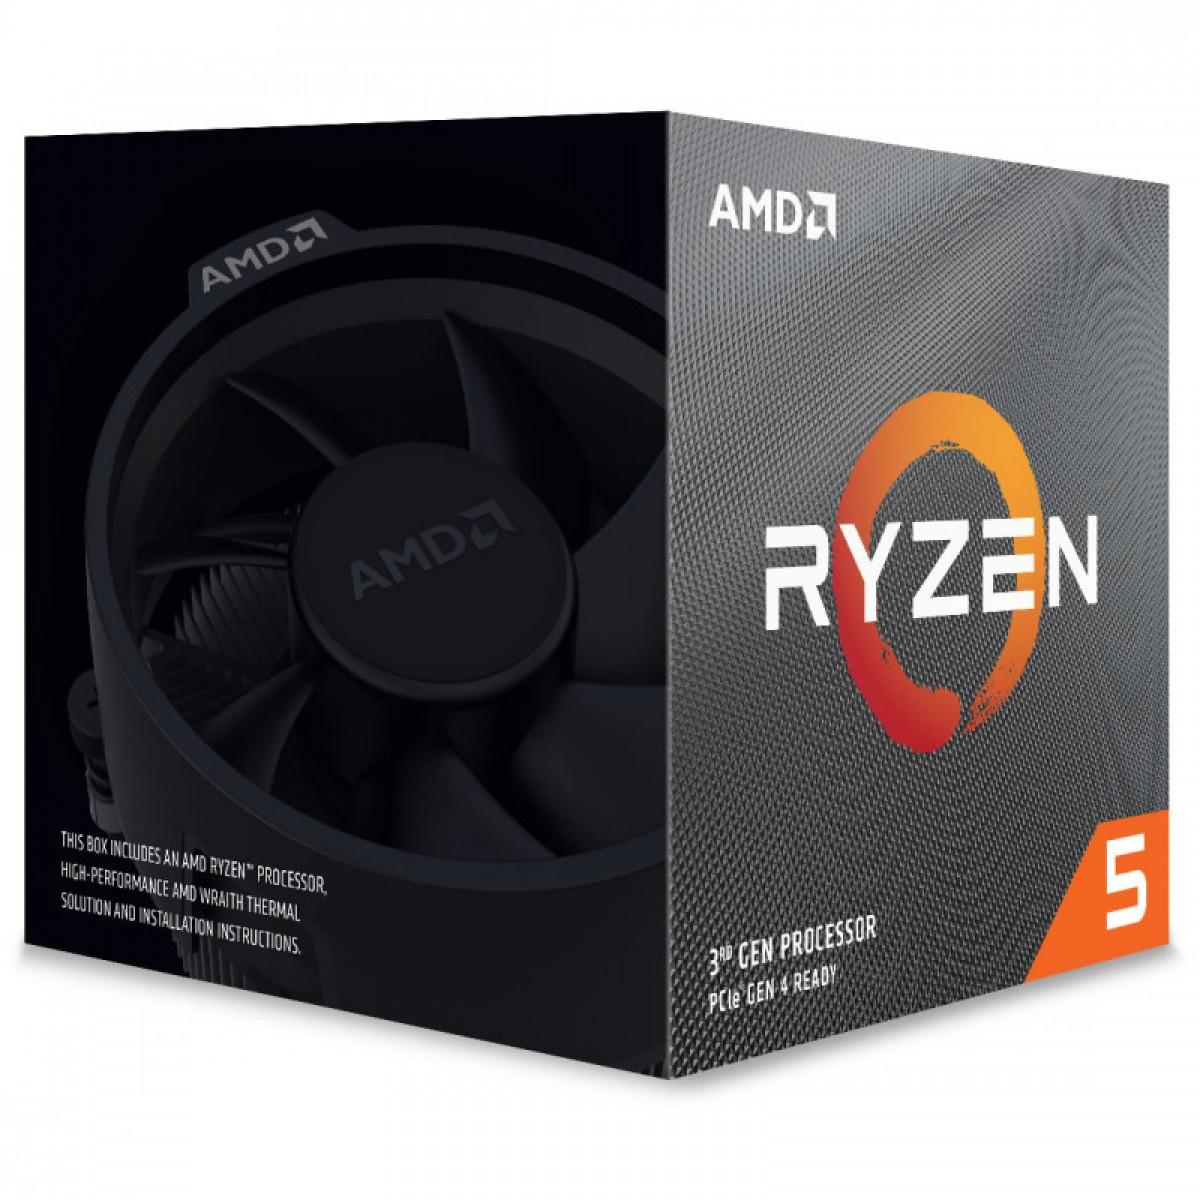 Processador AMD Ryzen 5 3600XT 3.8ghz (4.5ghz Turbo), 6-cores 12-threads, Cooler Wraith Spire, AM4, S/ Video, 100-100000281BOX